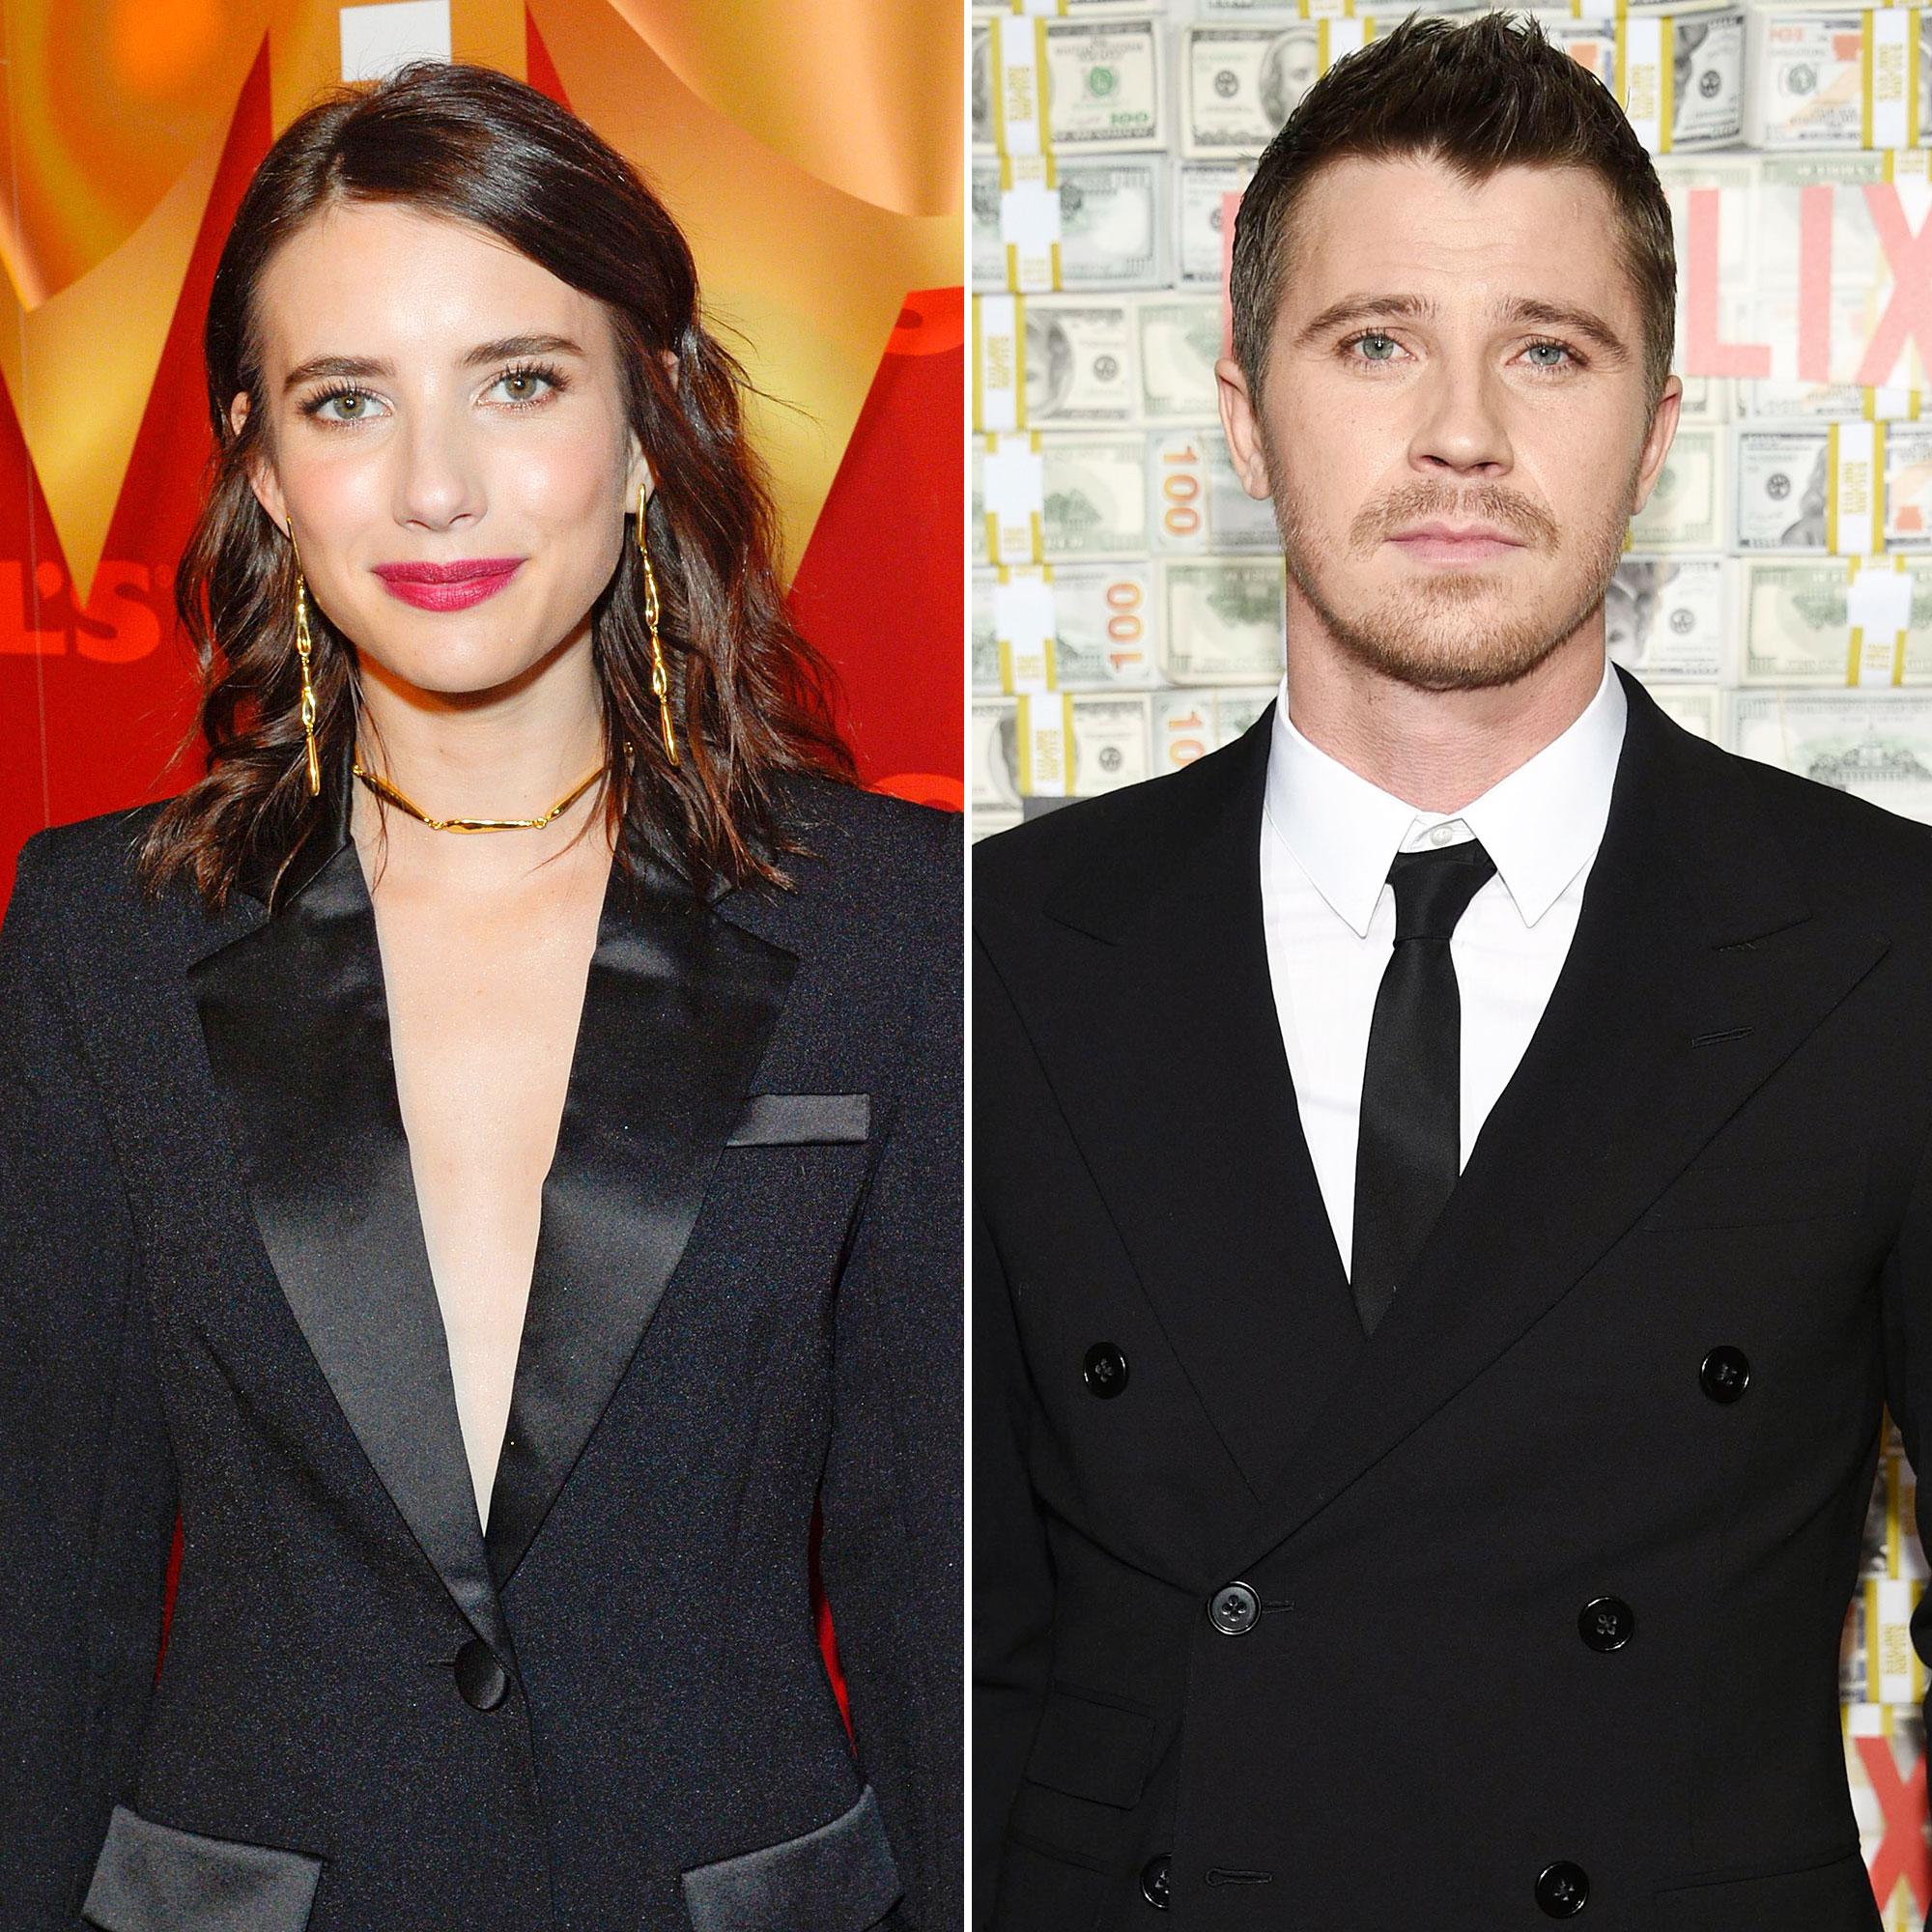 <div>Pregnant Emma Roberts, Garrett Hedlund Know Baby's Sex, Haven't Picked Name</div>